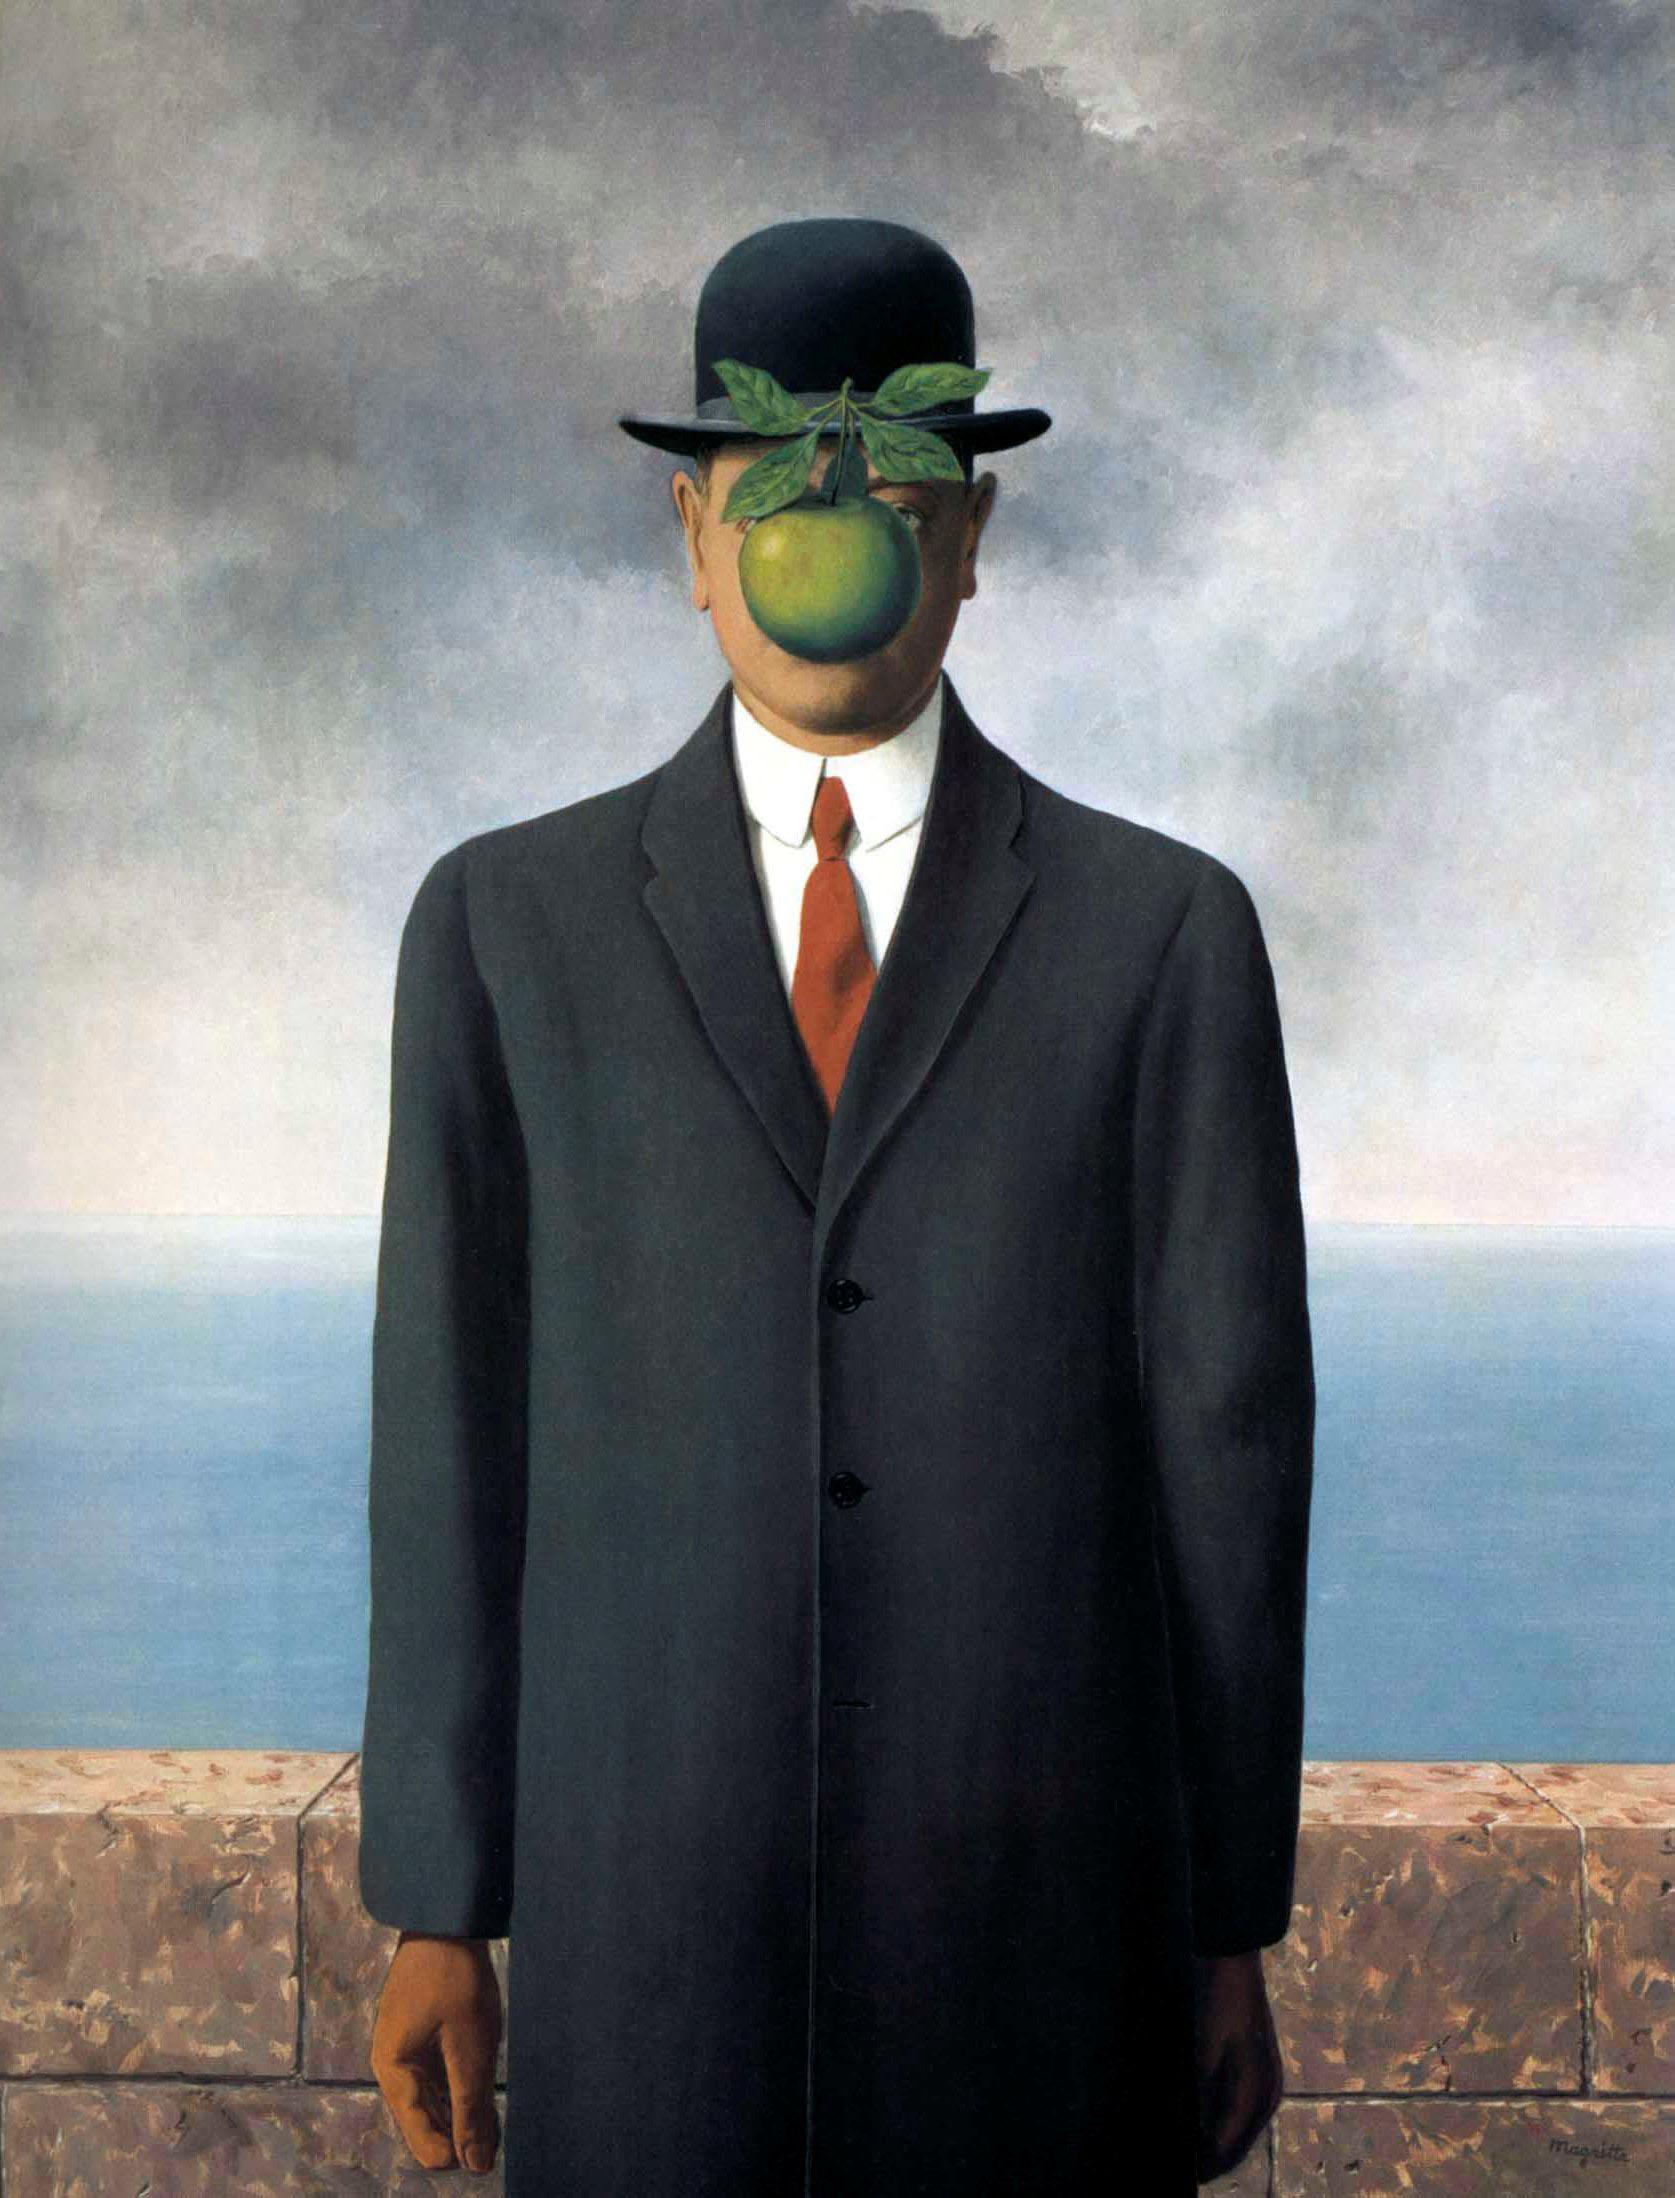 Le Fils de l'homme (Сын человеческий), Рене Магритт, сюрреализм